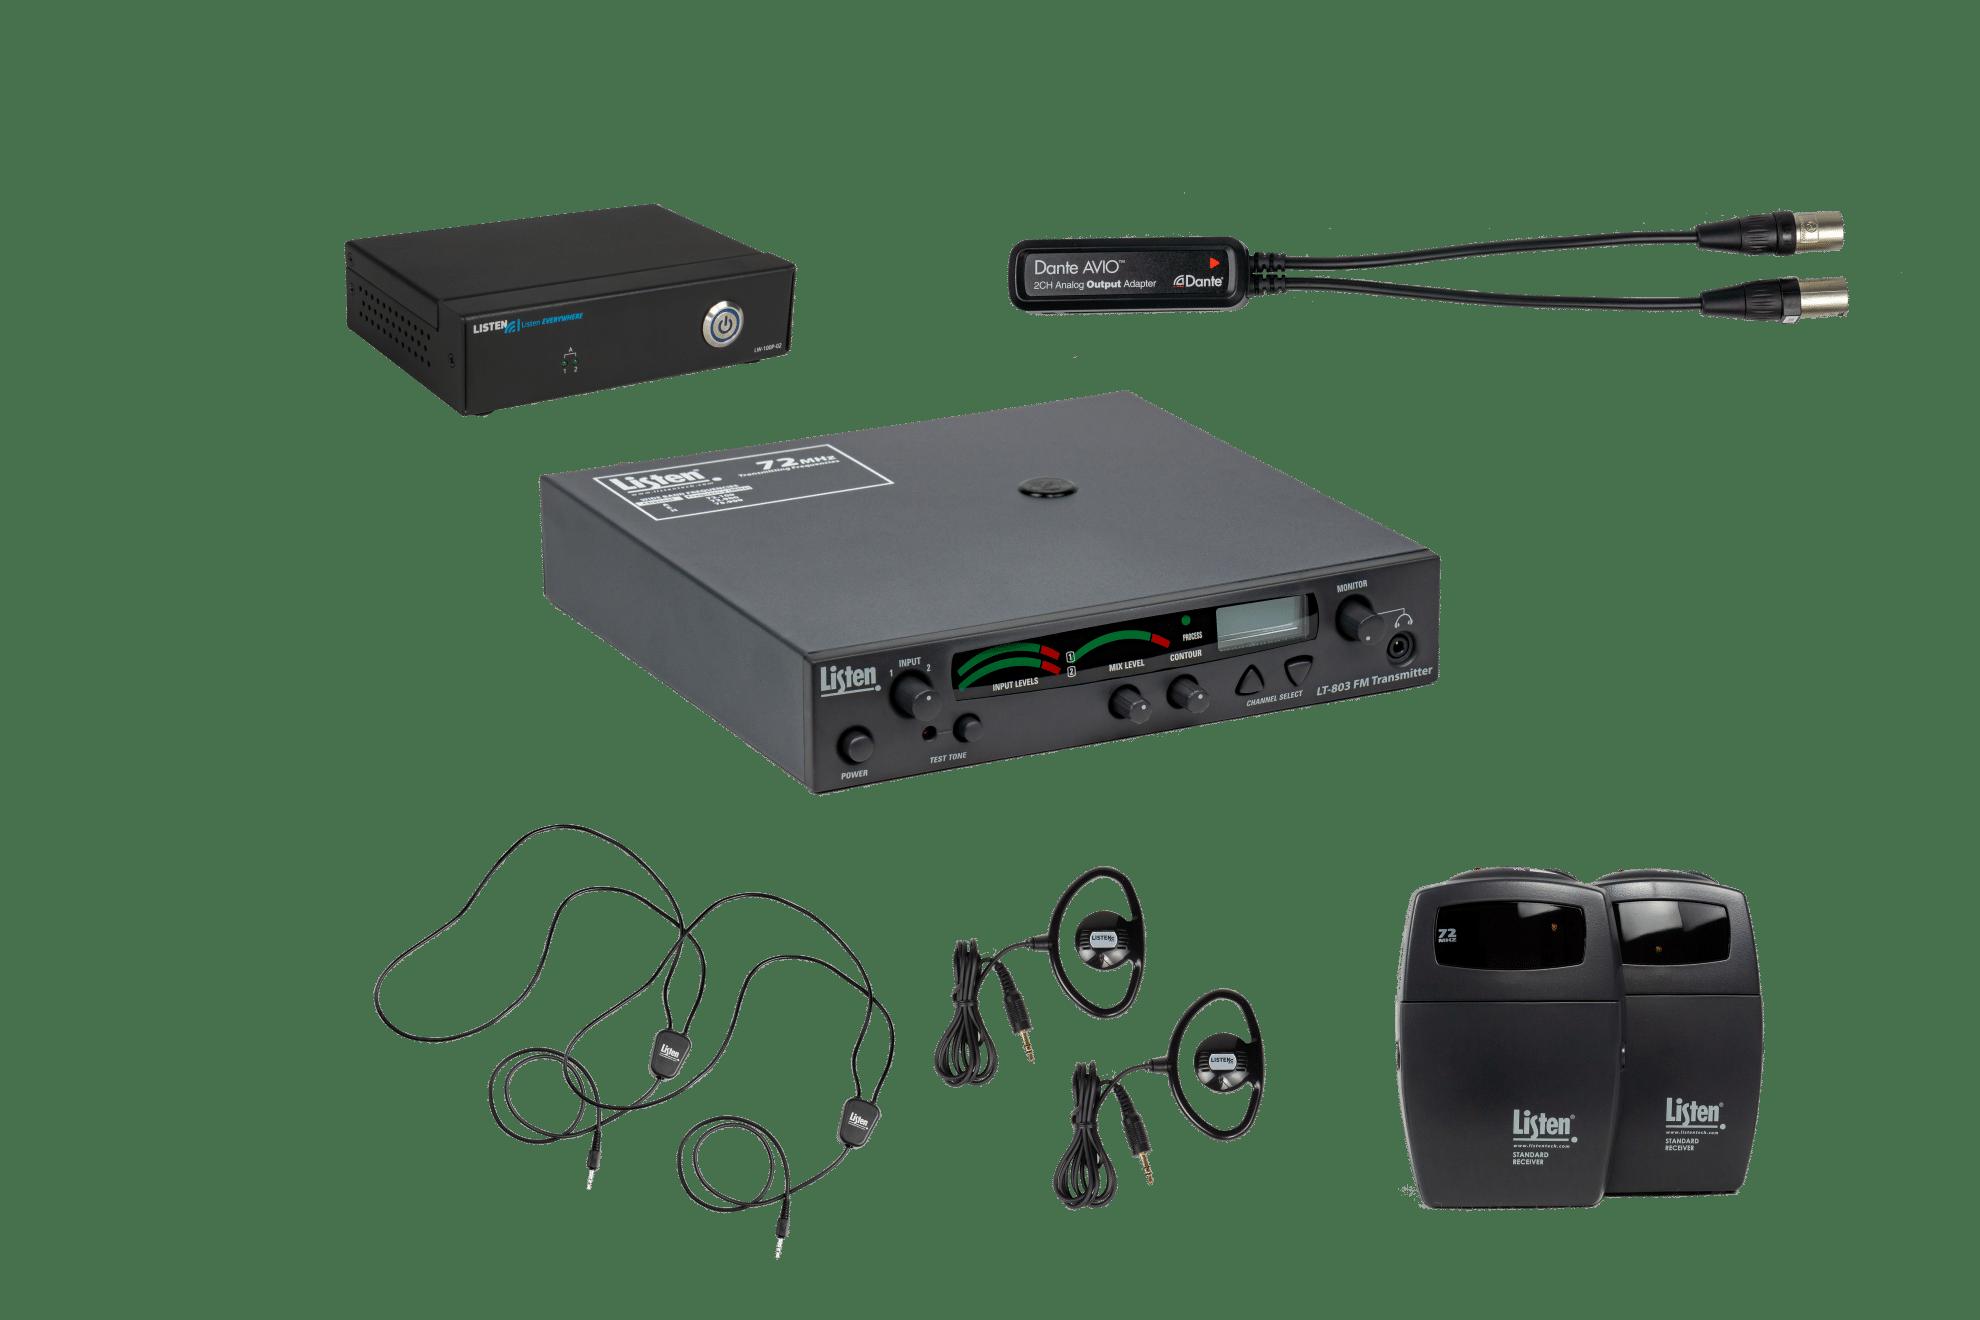 Wi-Fi/RF Base System (Dante)